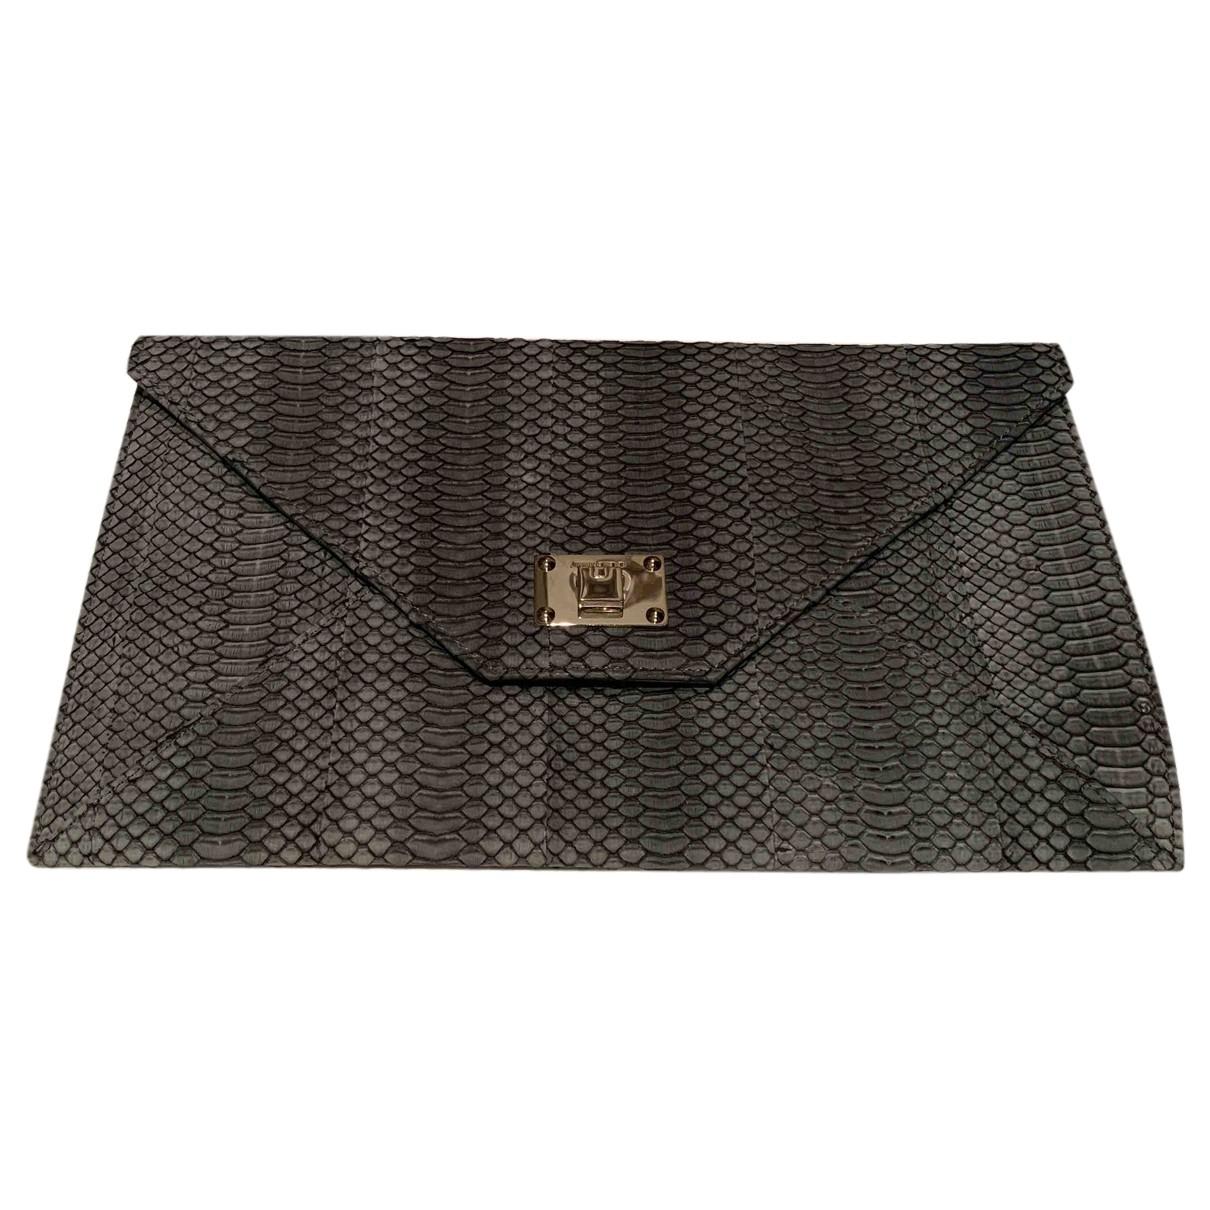 Jimmy Choo Rosetta Grey Leather Clutch bag for Women N